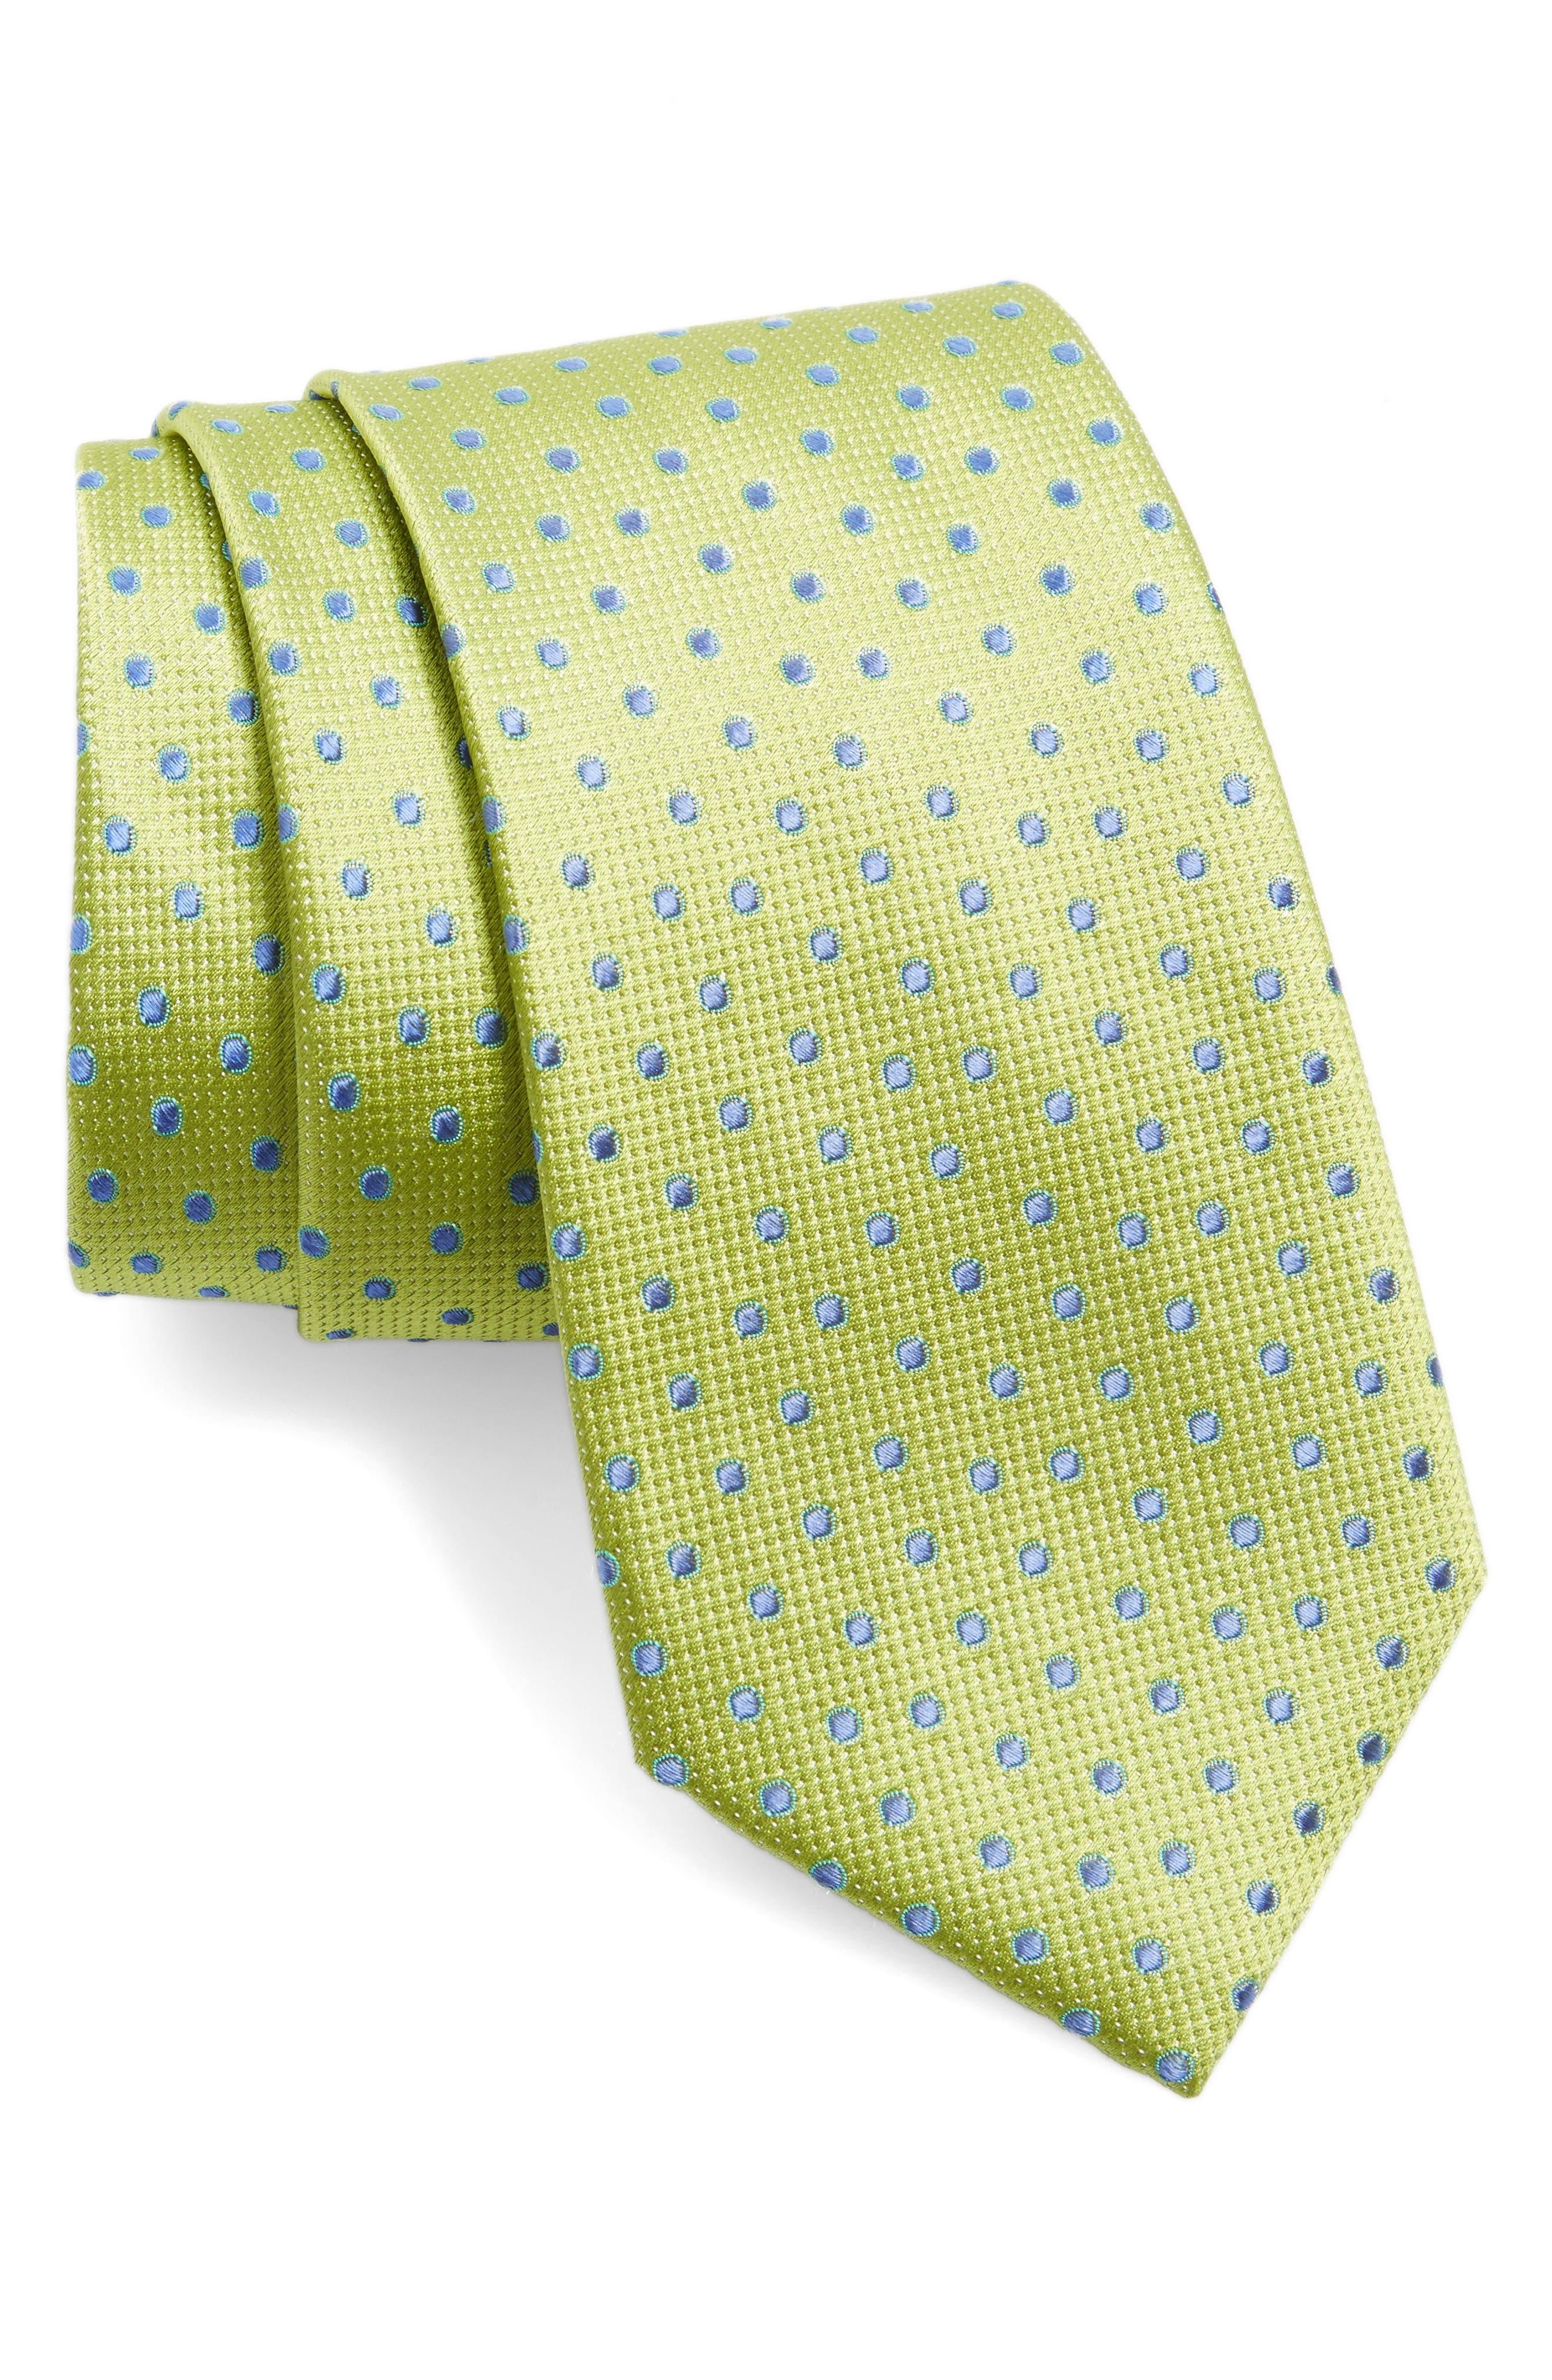 Main Image - Nordstrom Men's Shop Double Dot Silk Tie